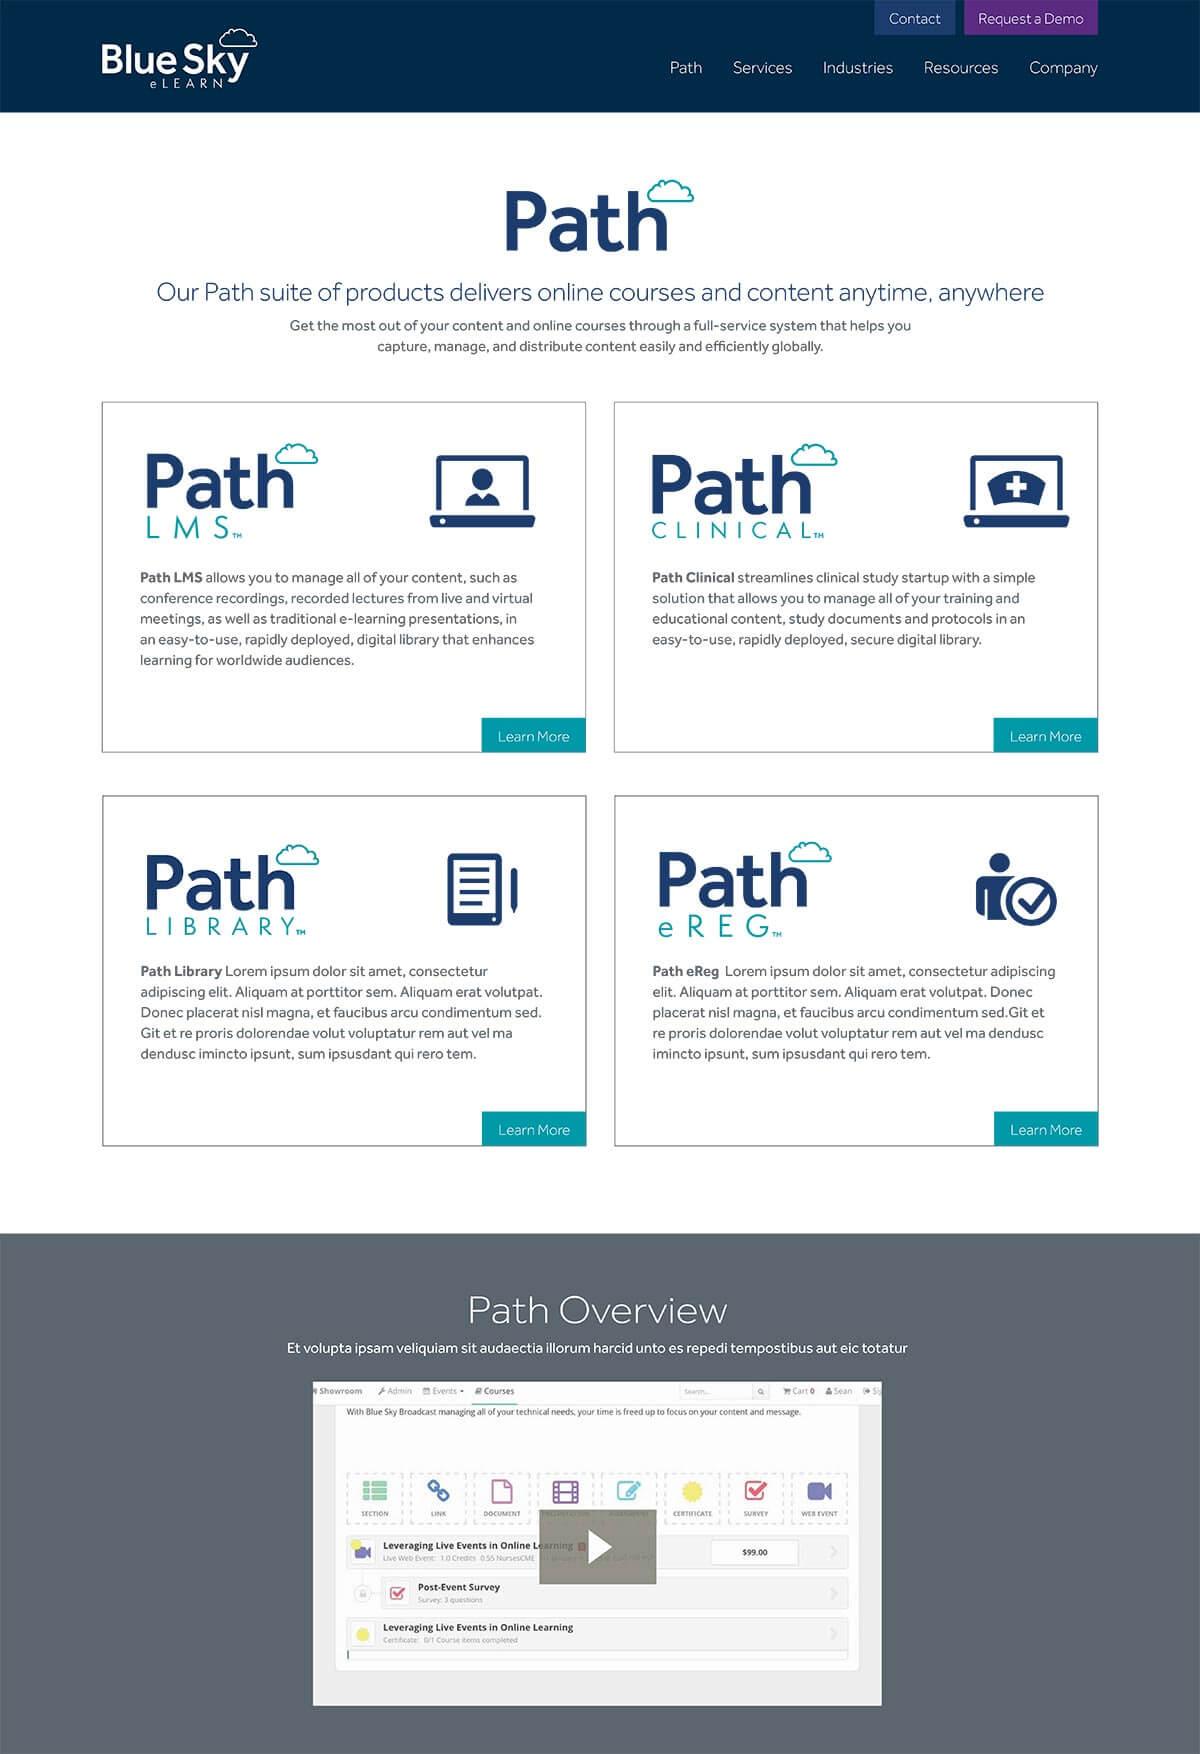 Blue Sky eLearn website path page